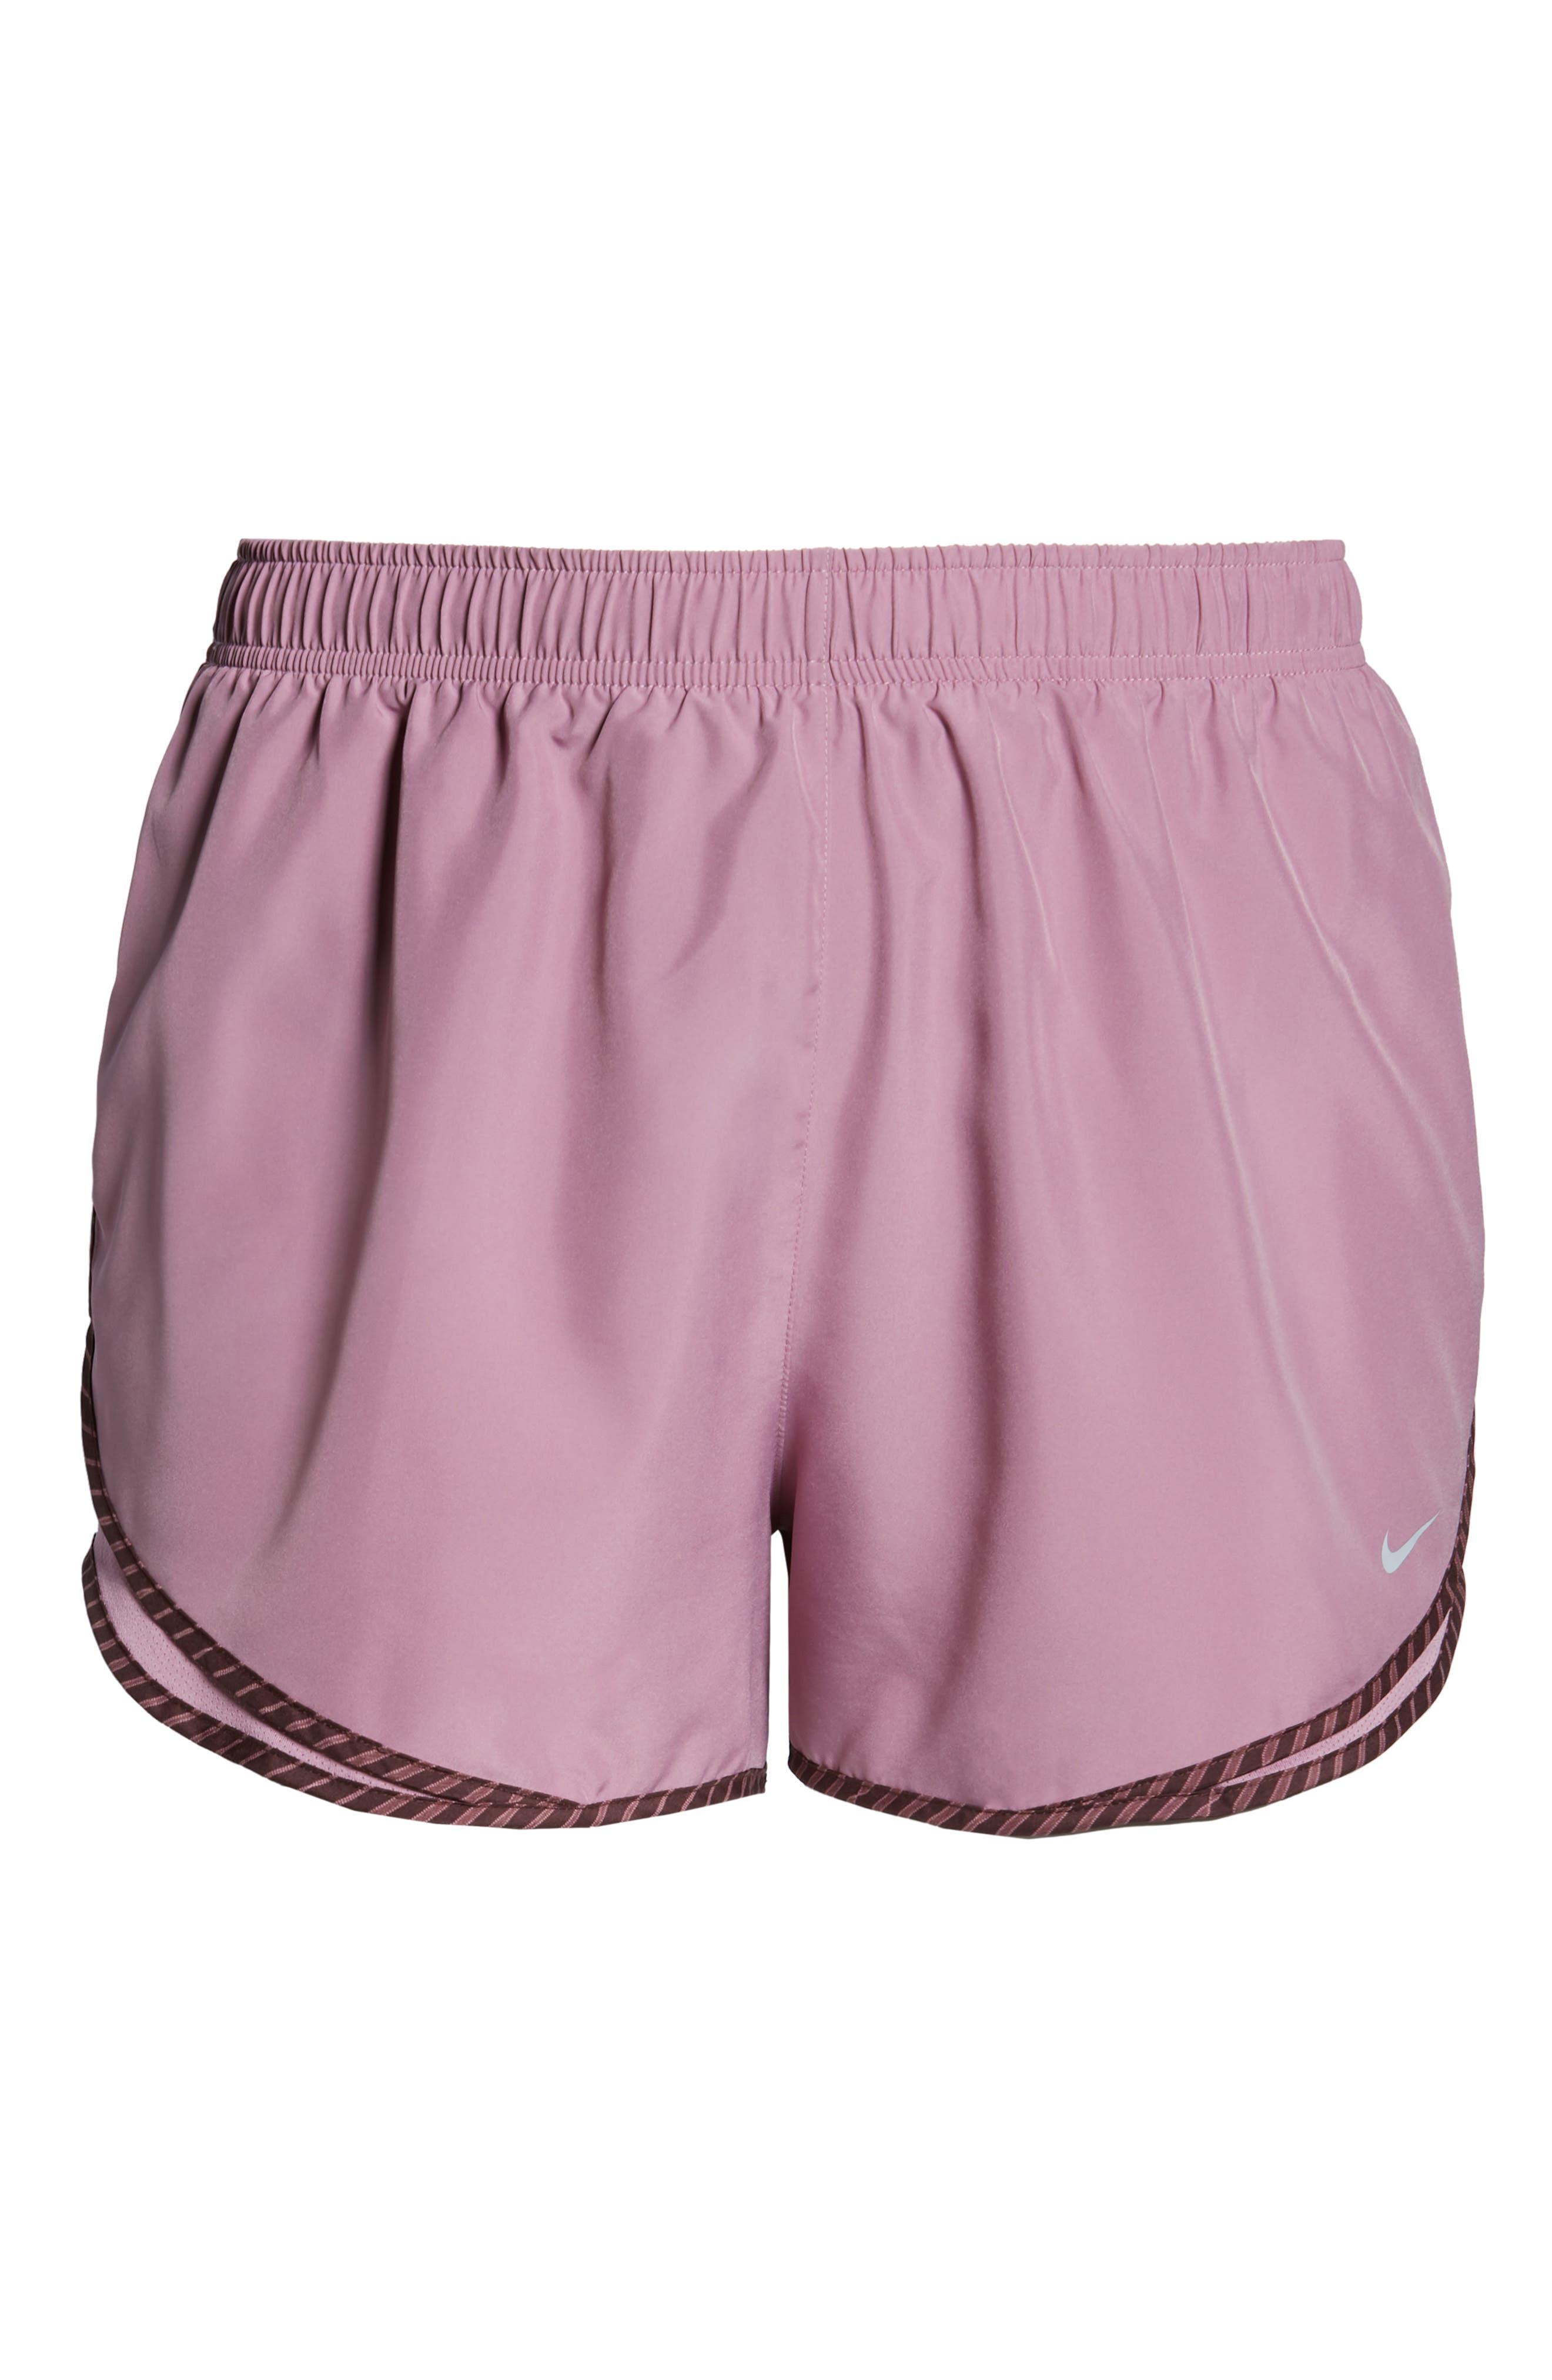 NIKE, Dry Tempo High Rise Running Shorts, Alternate thumbnail 7, color, PLUM/ EL DORADO/ WOLF GREY